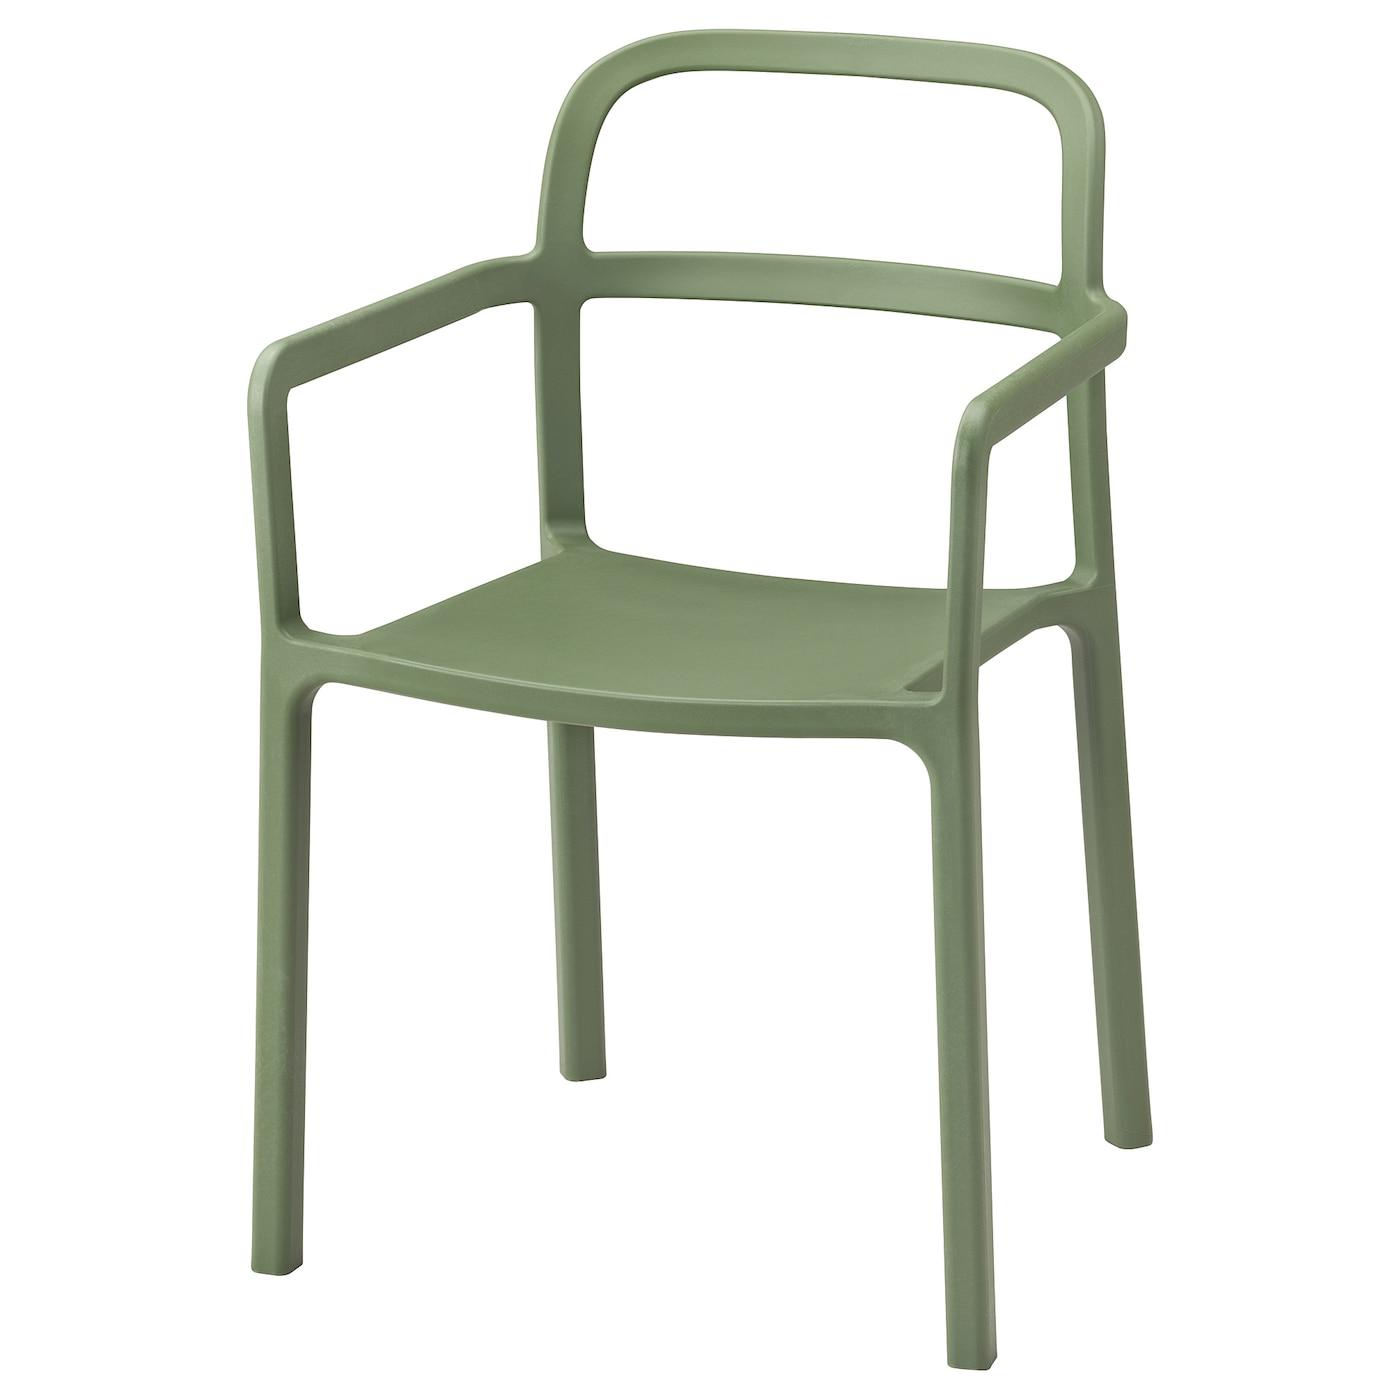 Ypperlig Armchair In Outdoor Green Ikea